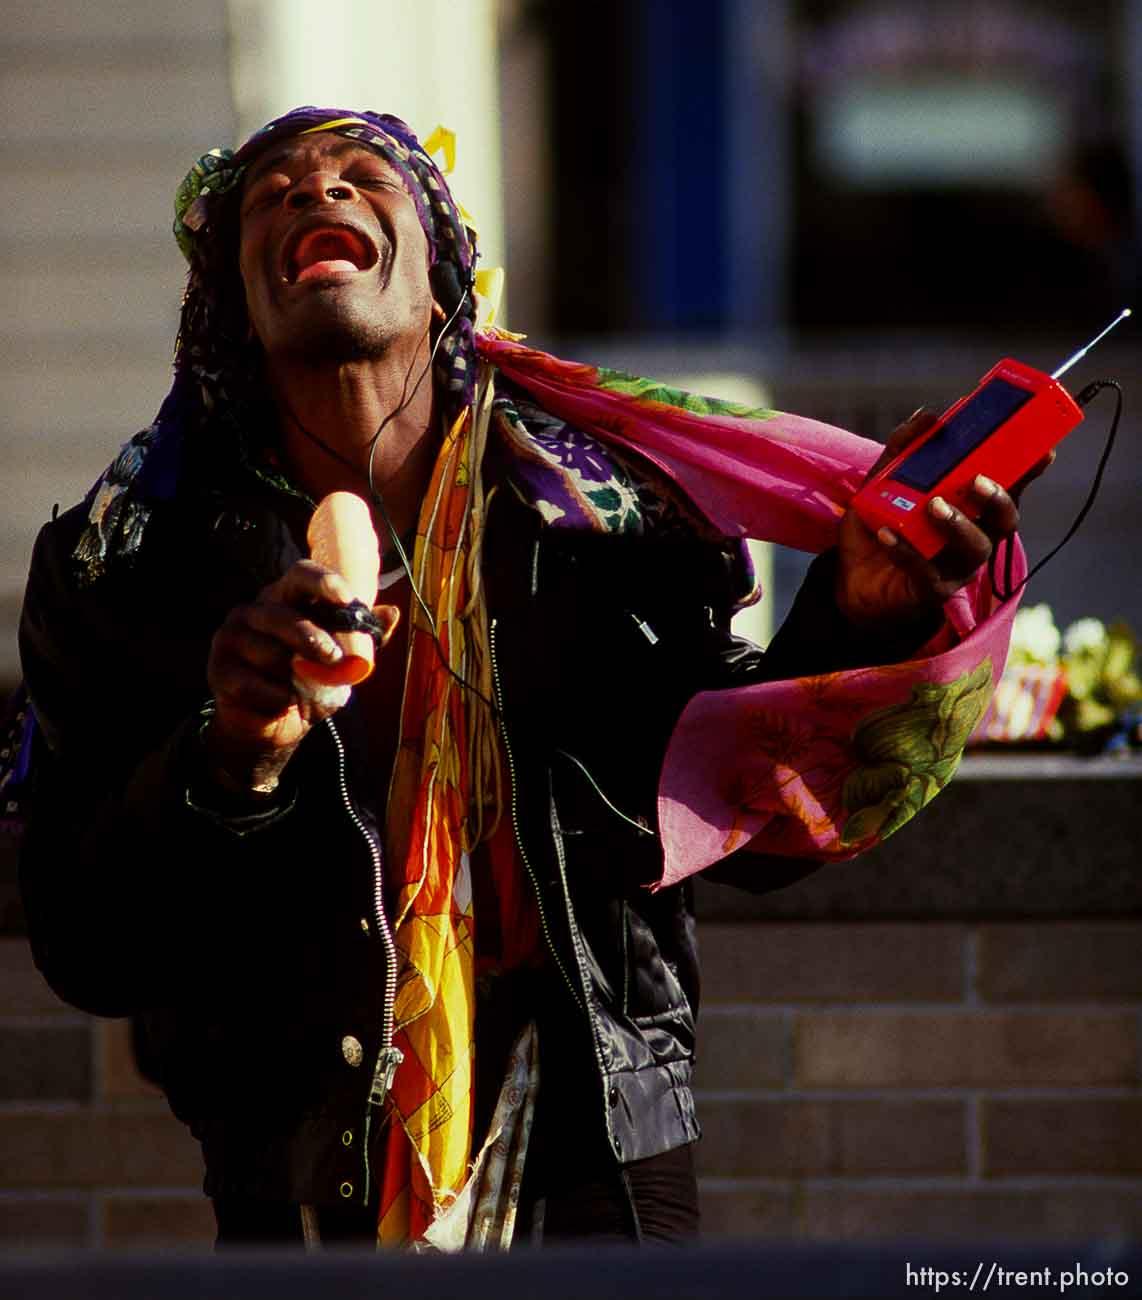 Guy singing into a dildo, november 1988.